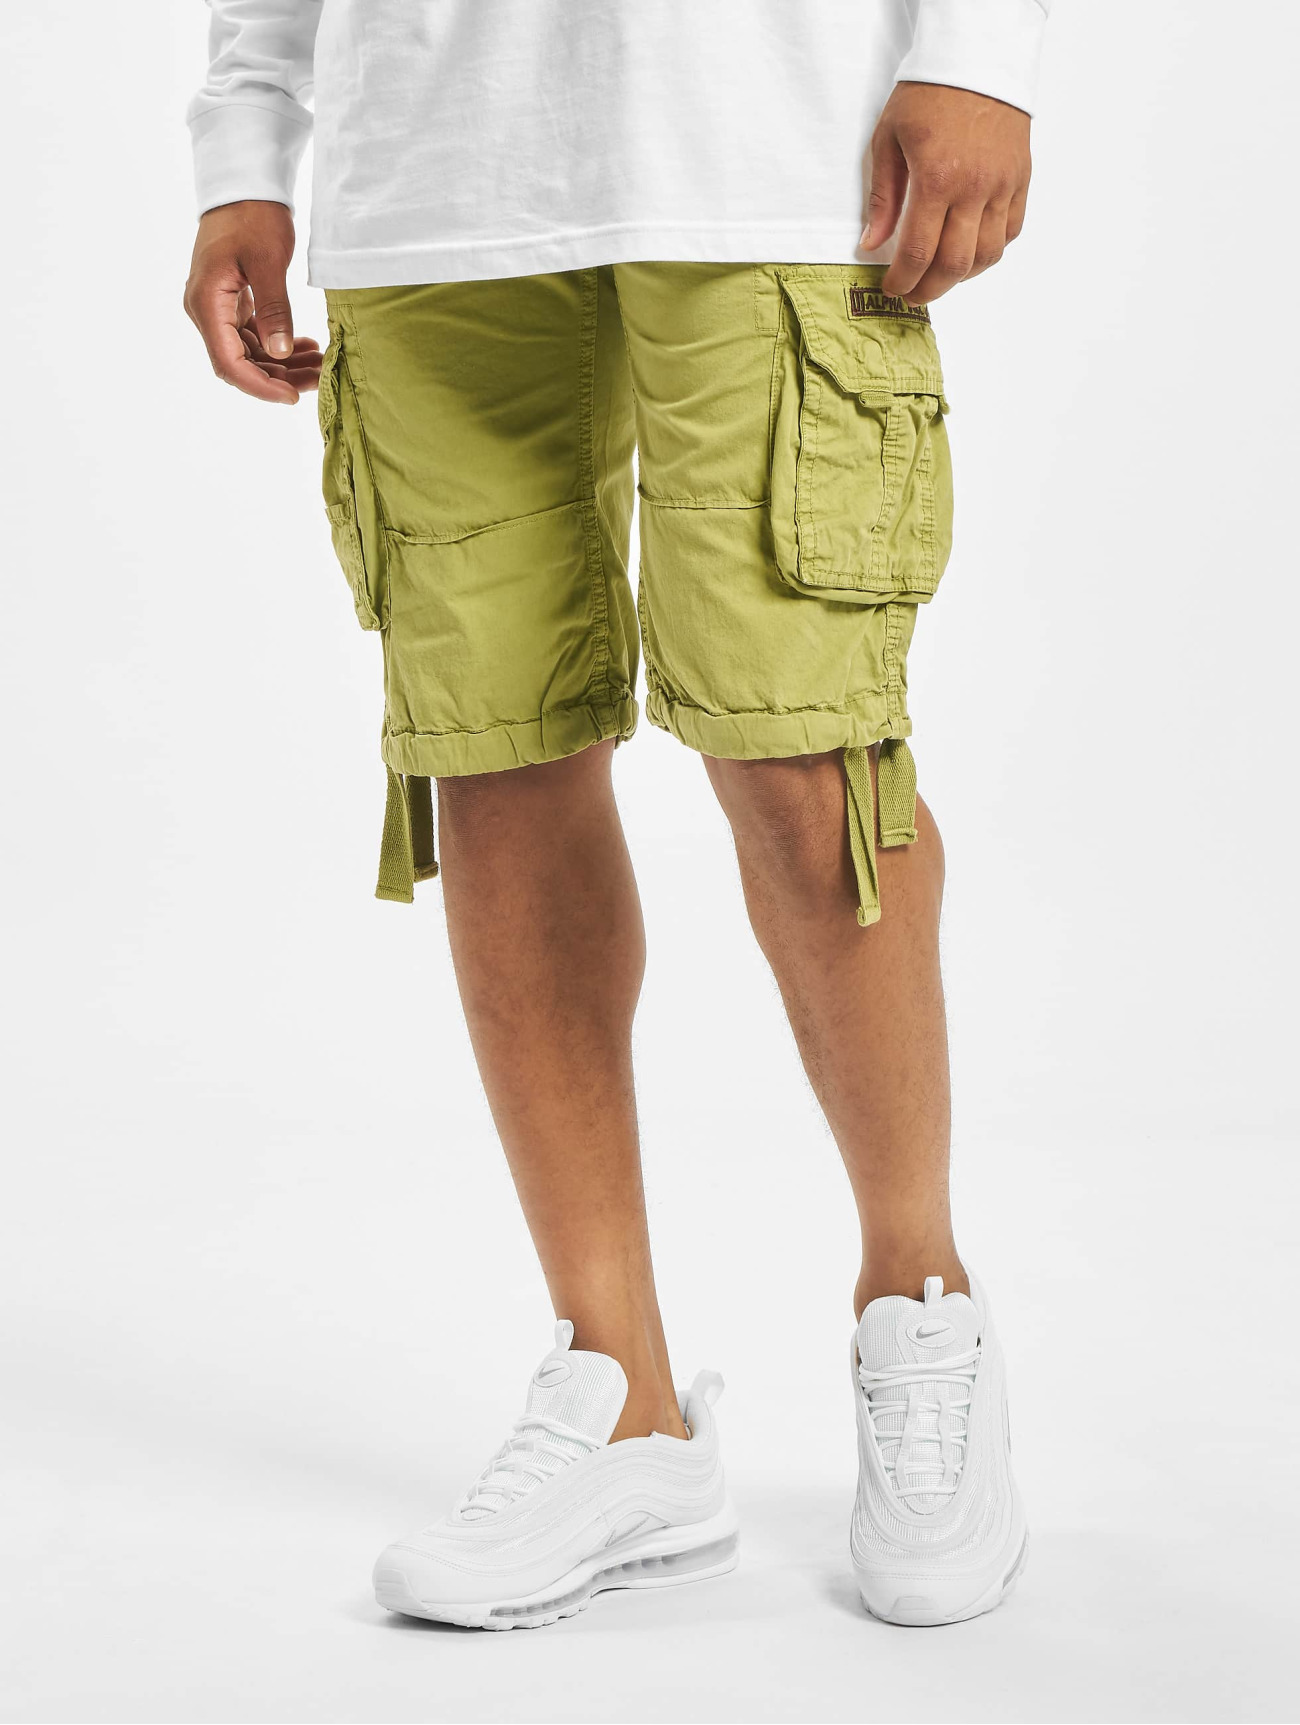 Alpha Industries  Jet   kaki Homme Short  606712 Homme Pantalons & Shorts